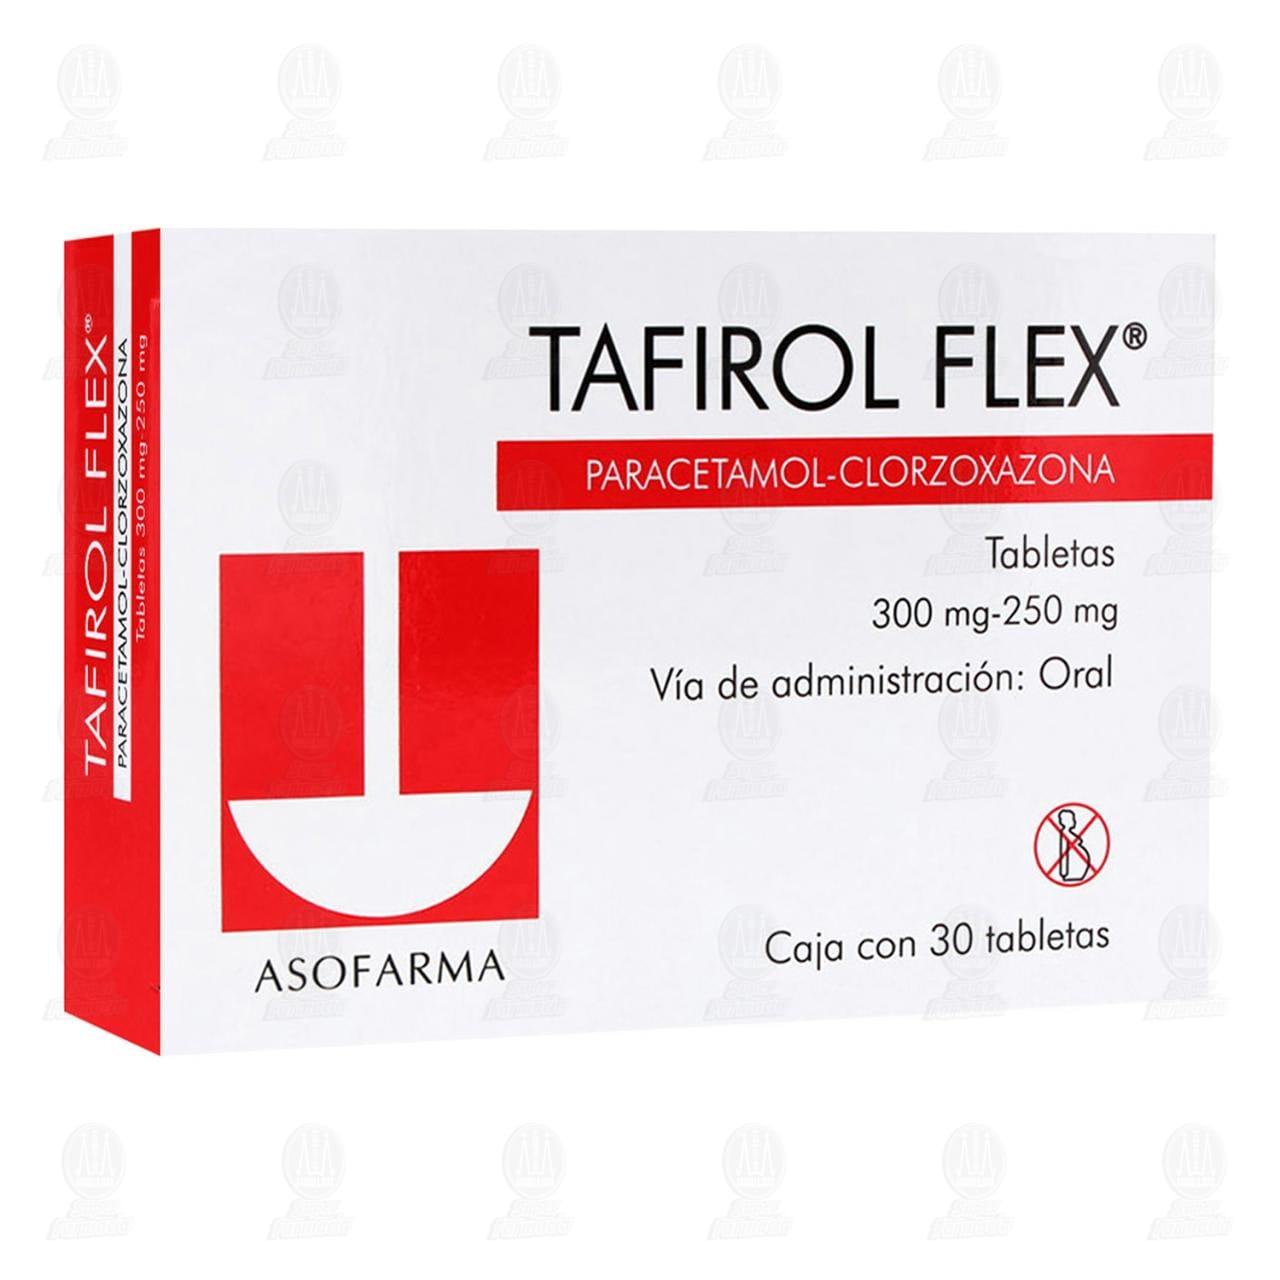 Tafirol Flex 300mg/250mg 30 Tabletas